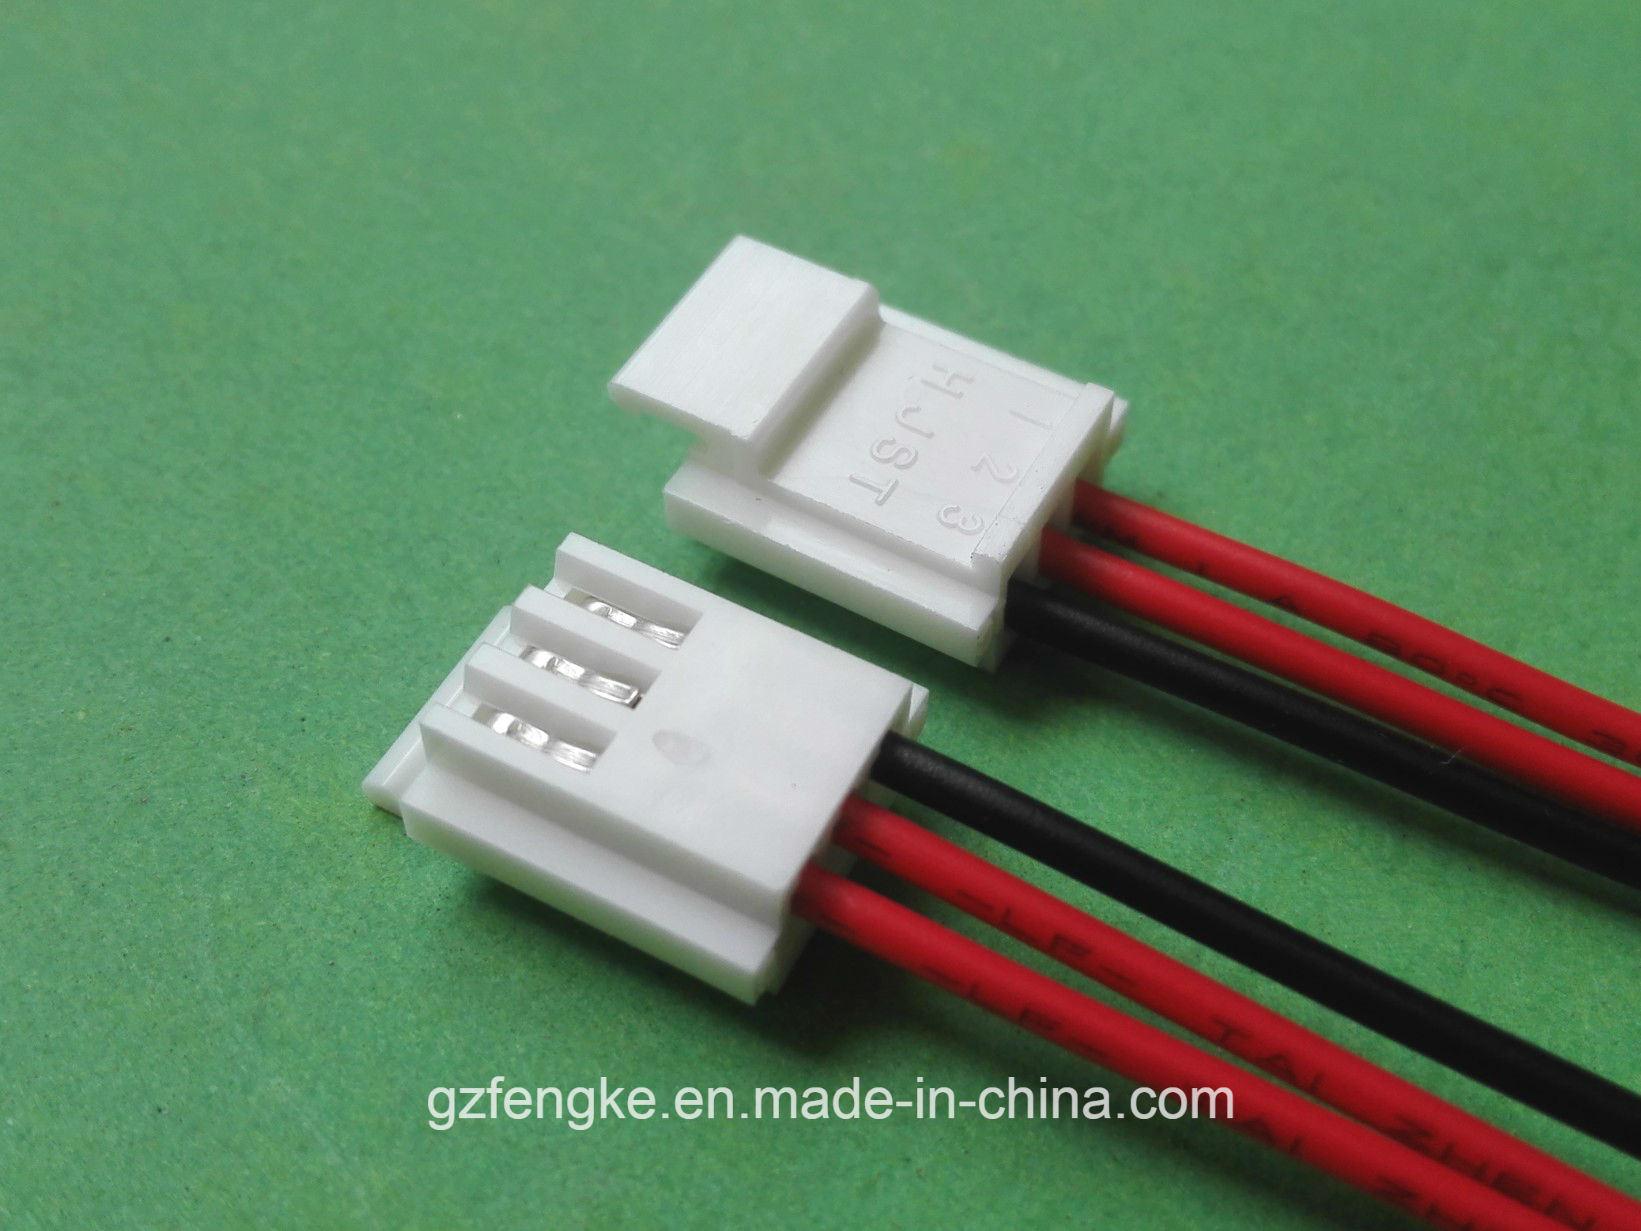 hight resolution of china plastic plug connector plastic plug connector manufacturers suppliers price made in china com